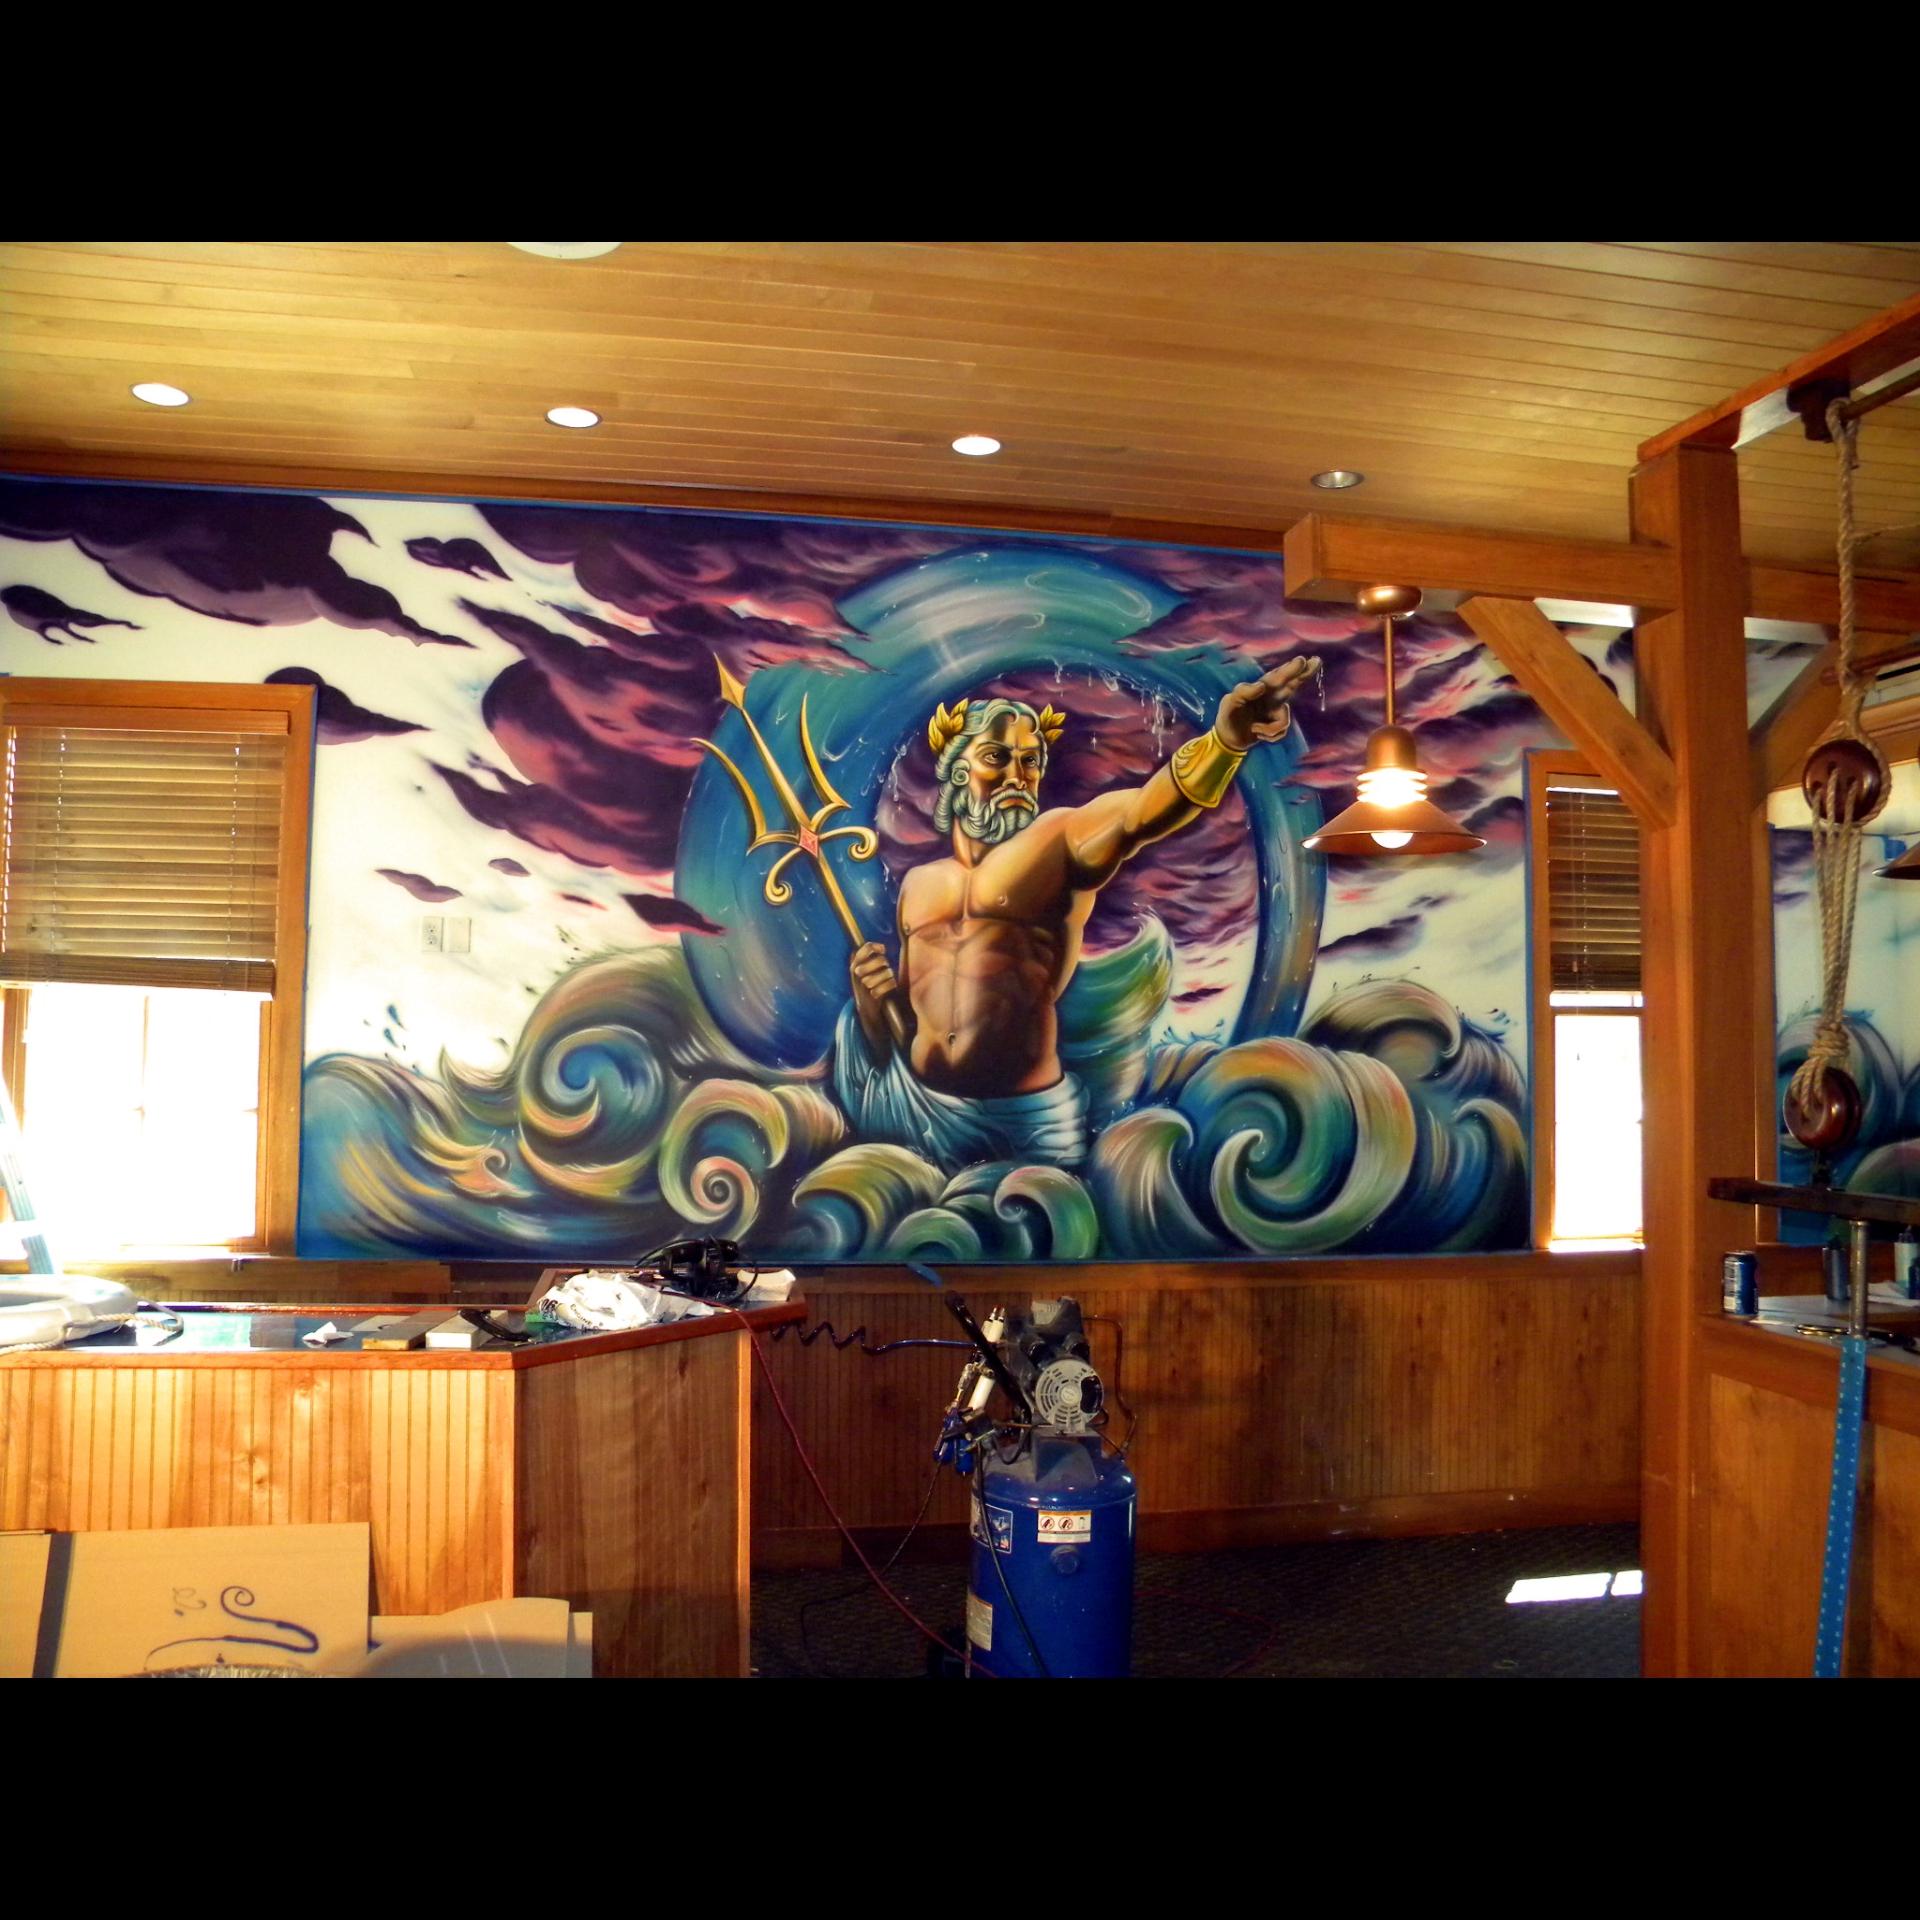 Poseidon Mural_room view.jpg